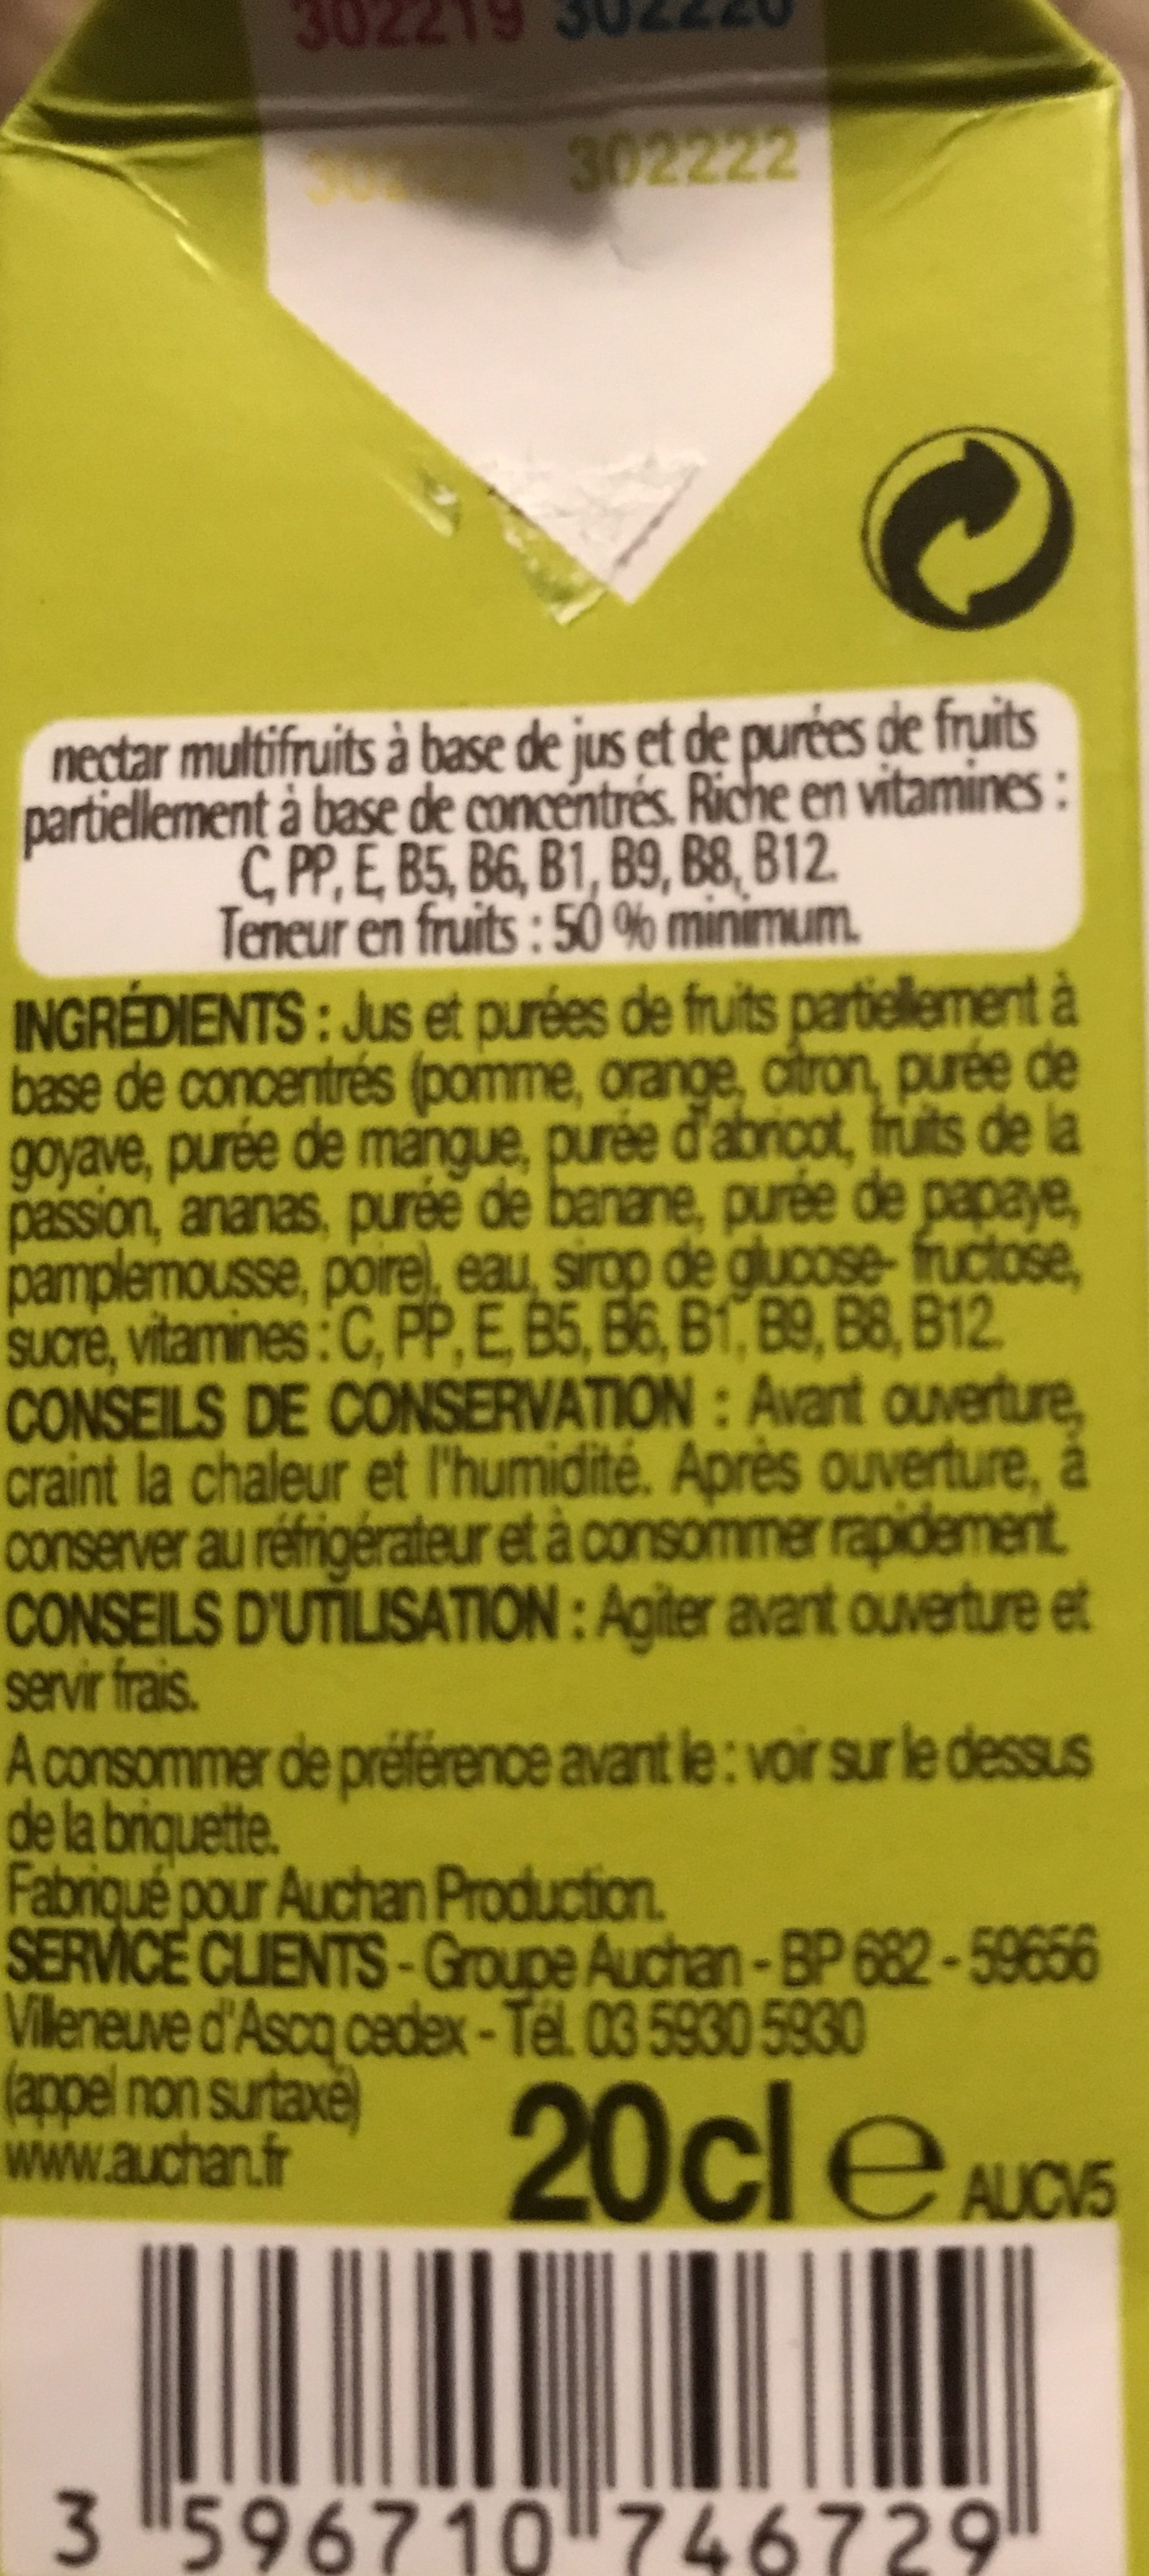 Nectar multivitamine 12 fruits - Ingrediënten - fr